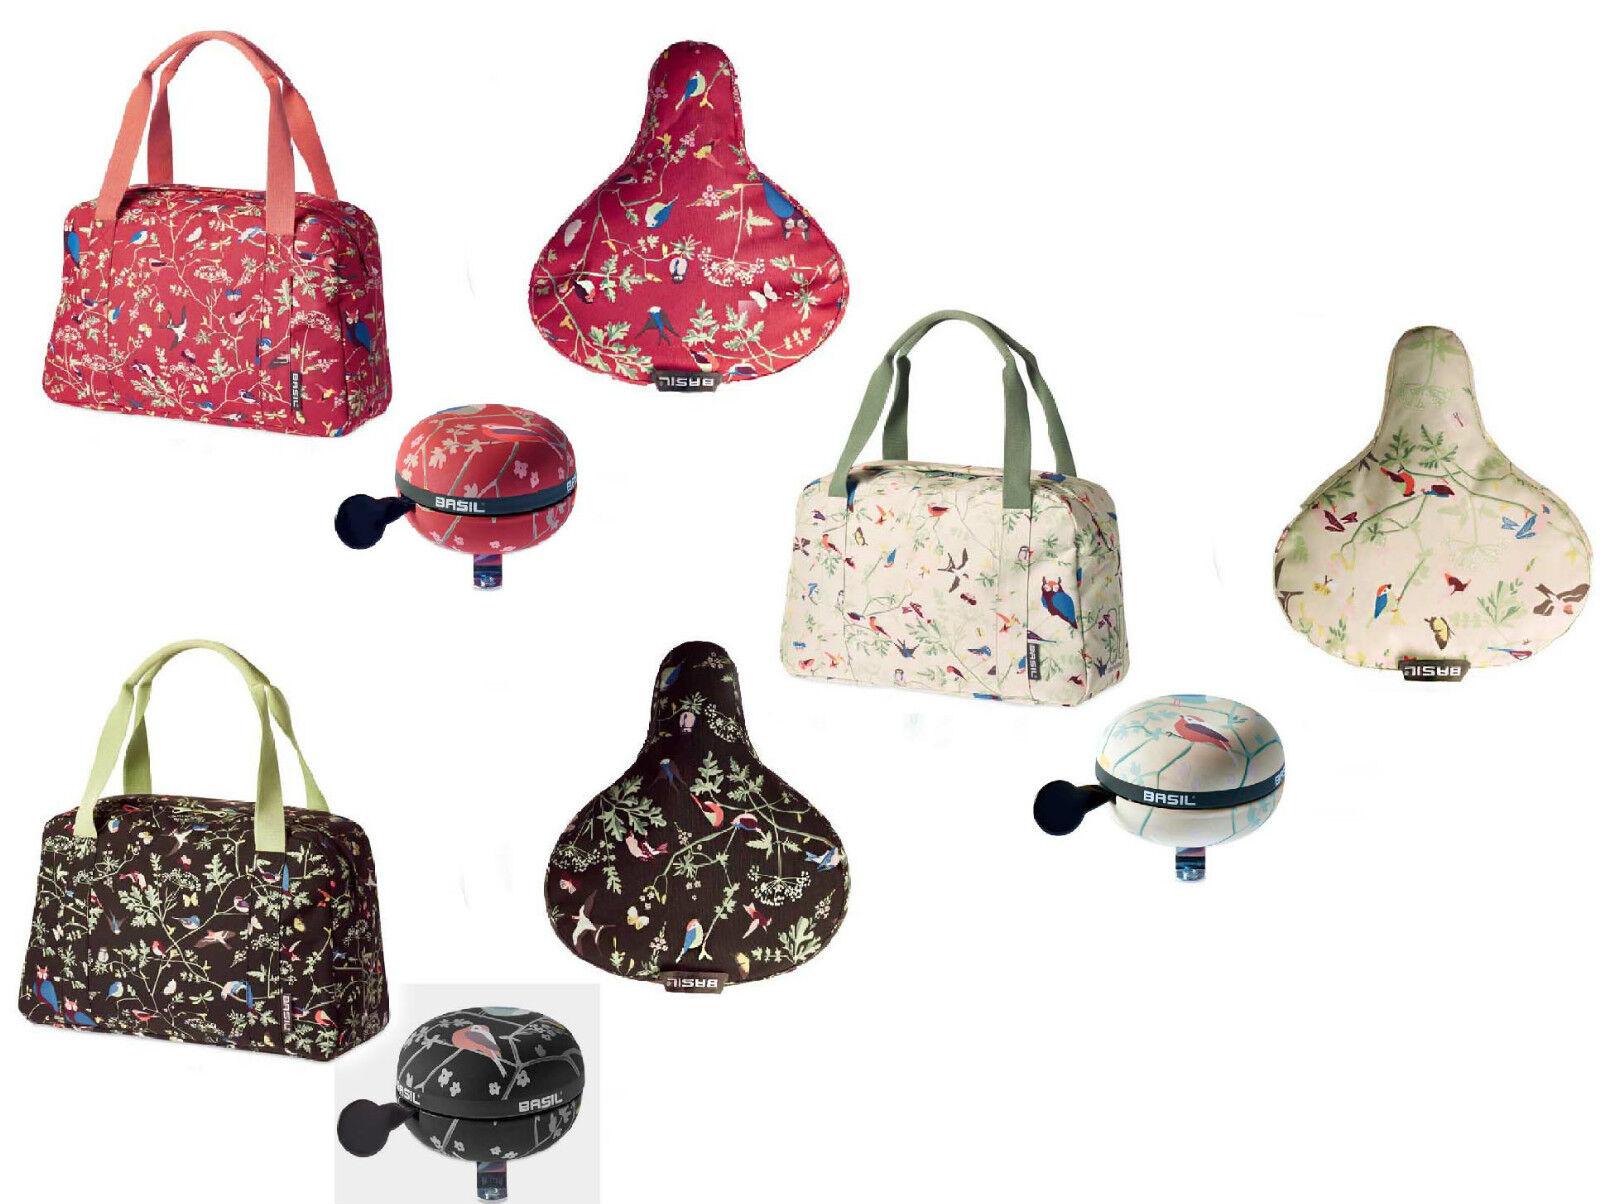 Set  Basil wanderlust carry all Bag bolso & sattellbezug & timbre